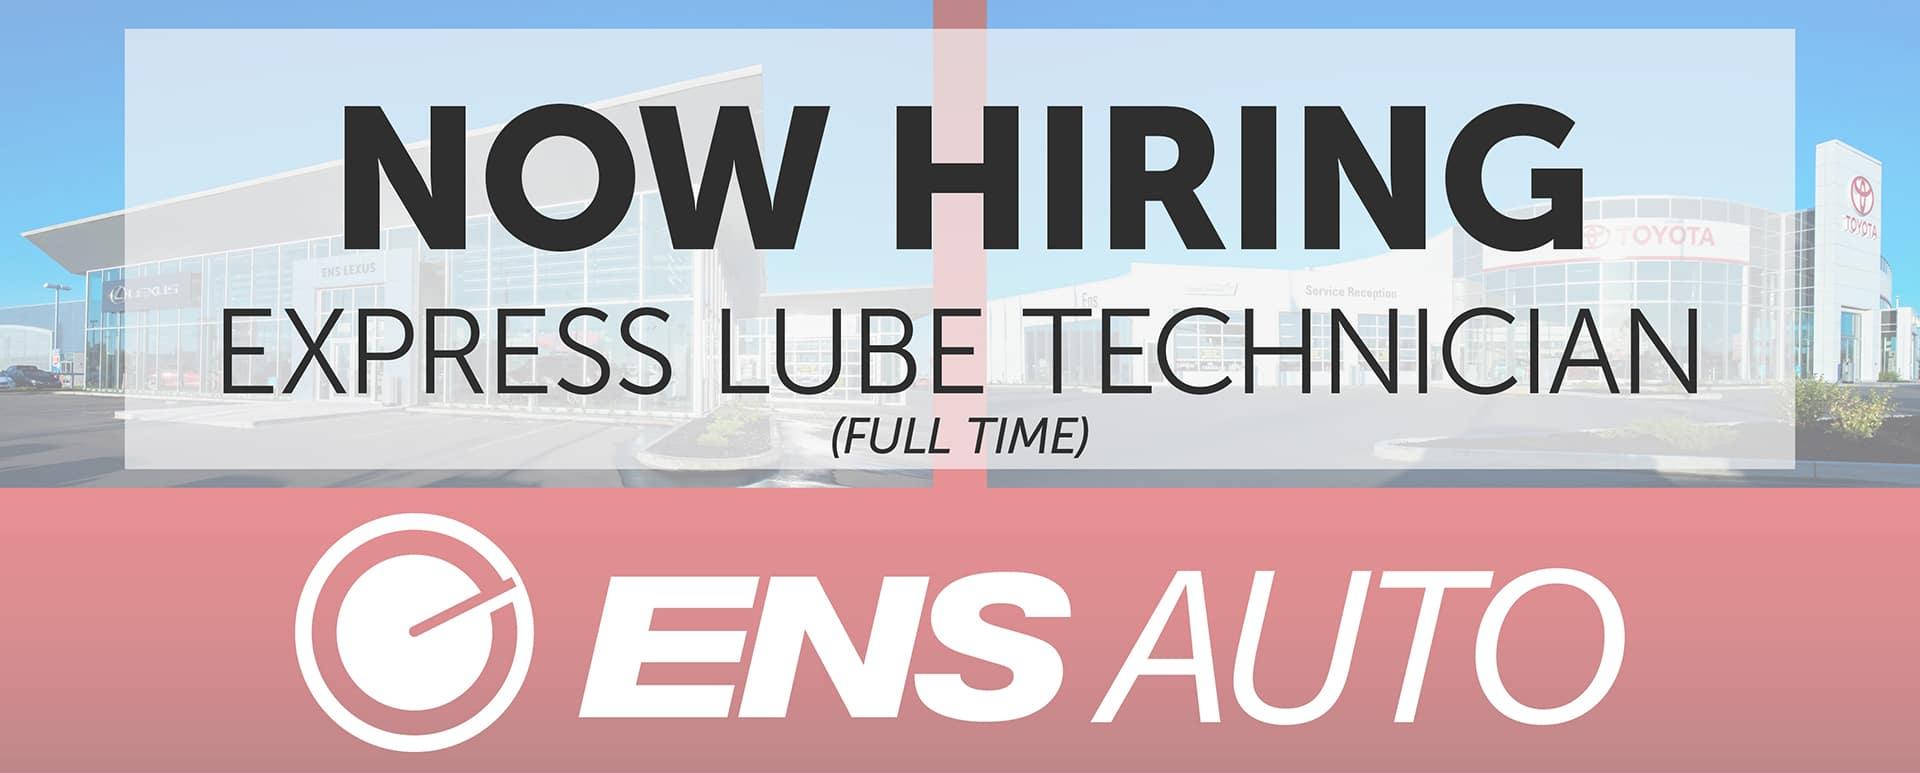 Now Hiring Express Lube Technician Ens Toyota